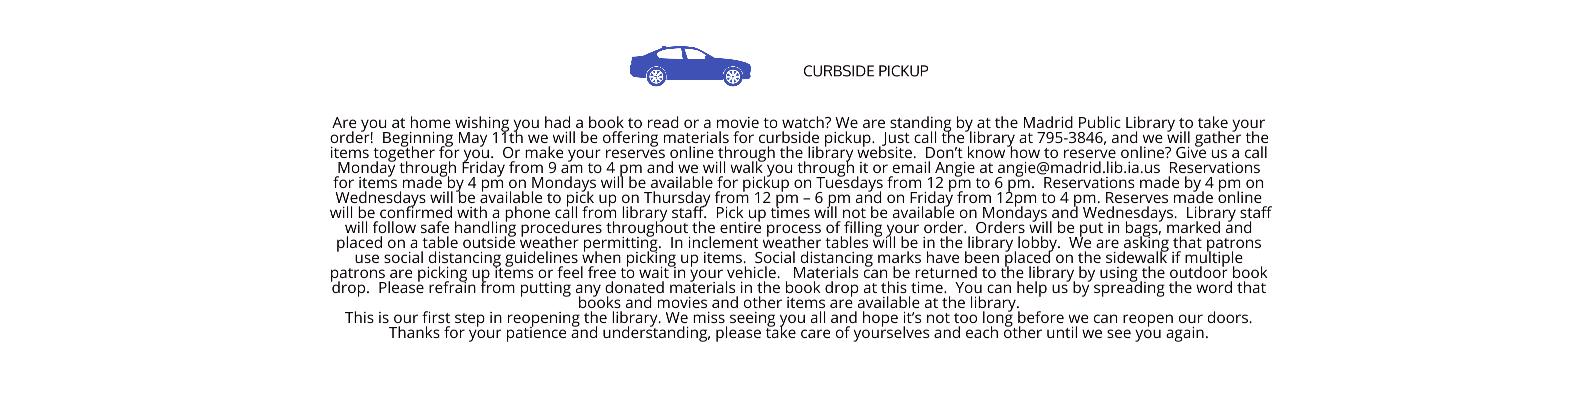 curbside details 1